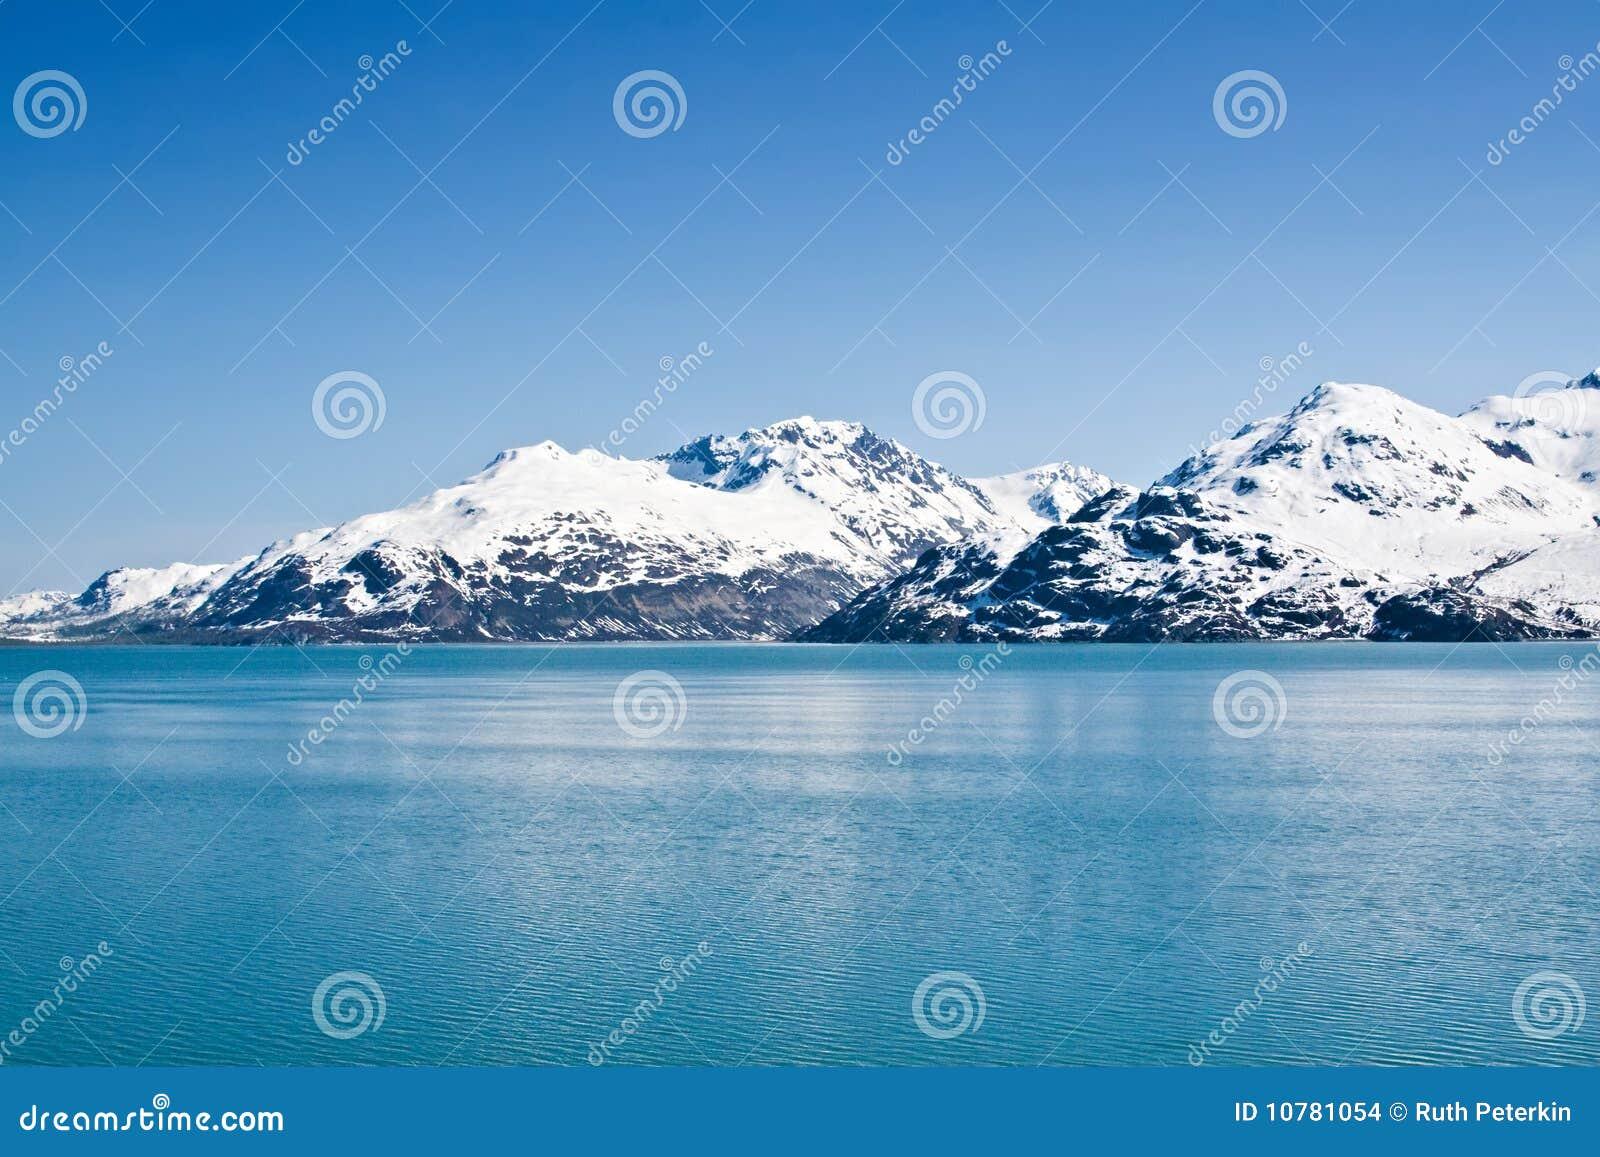 De Baai van de gletsjer, Alaska